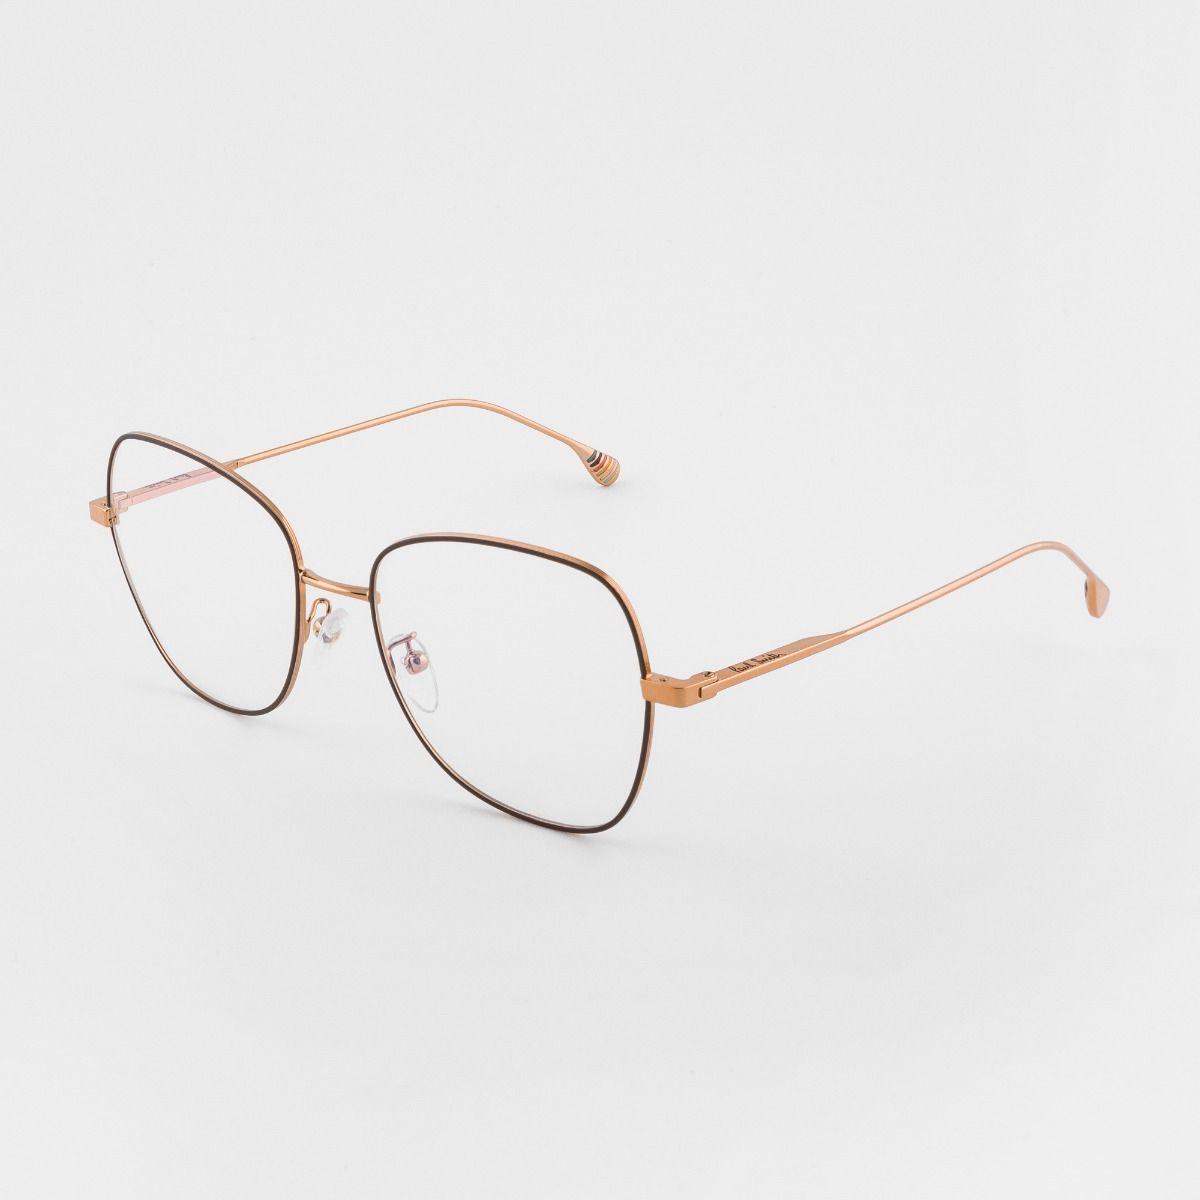 Paul Smith Davis Optical Square Glasses